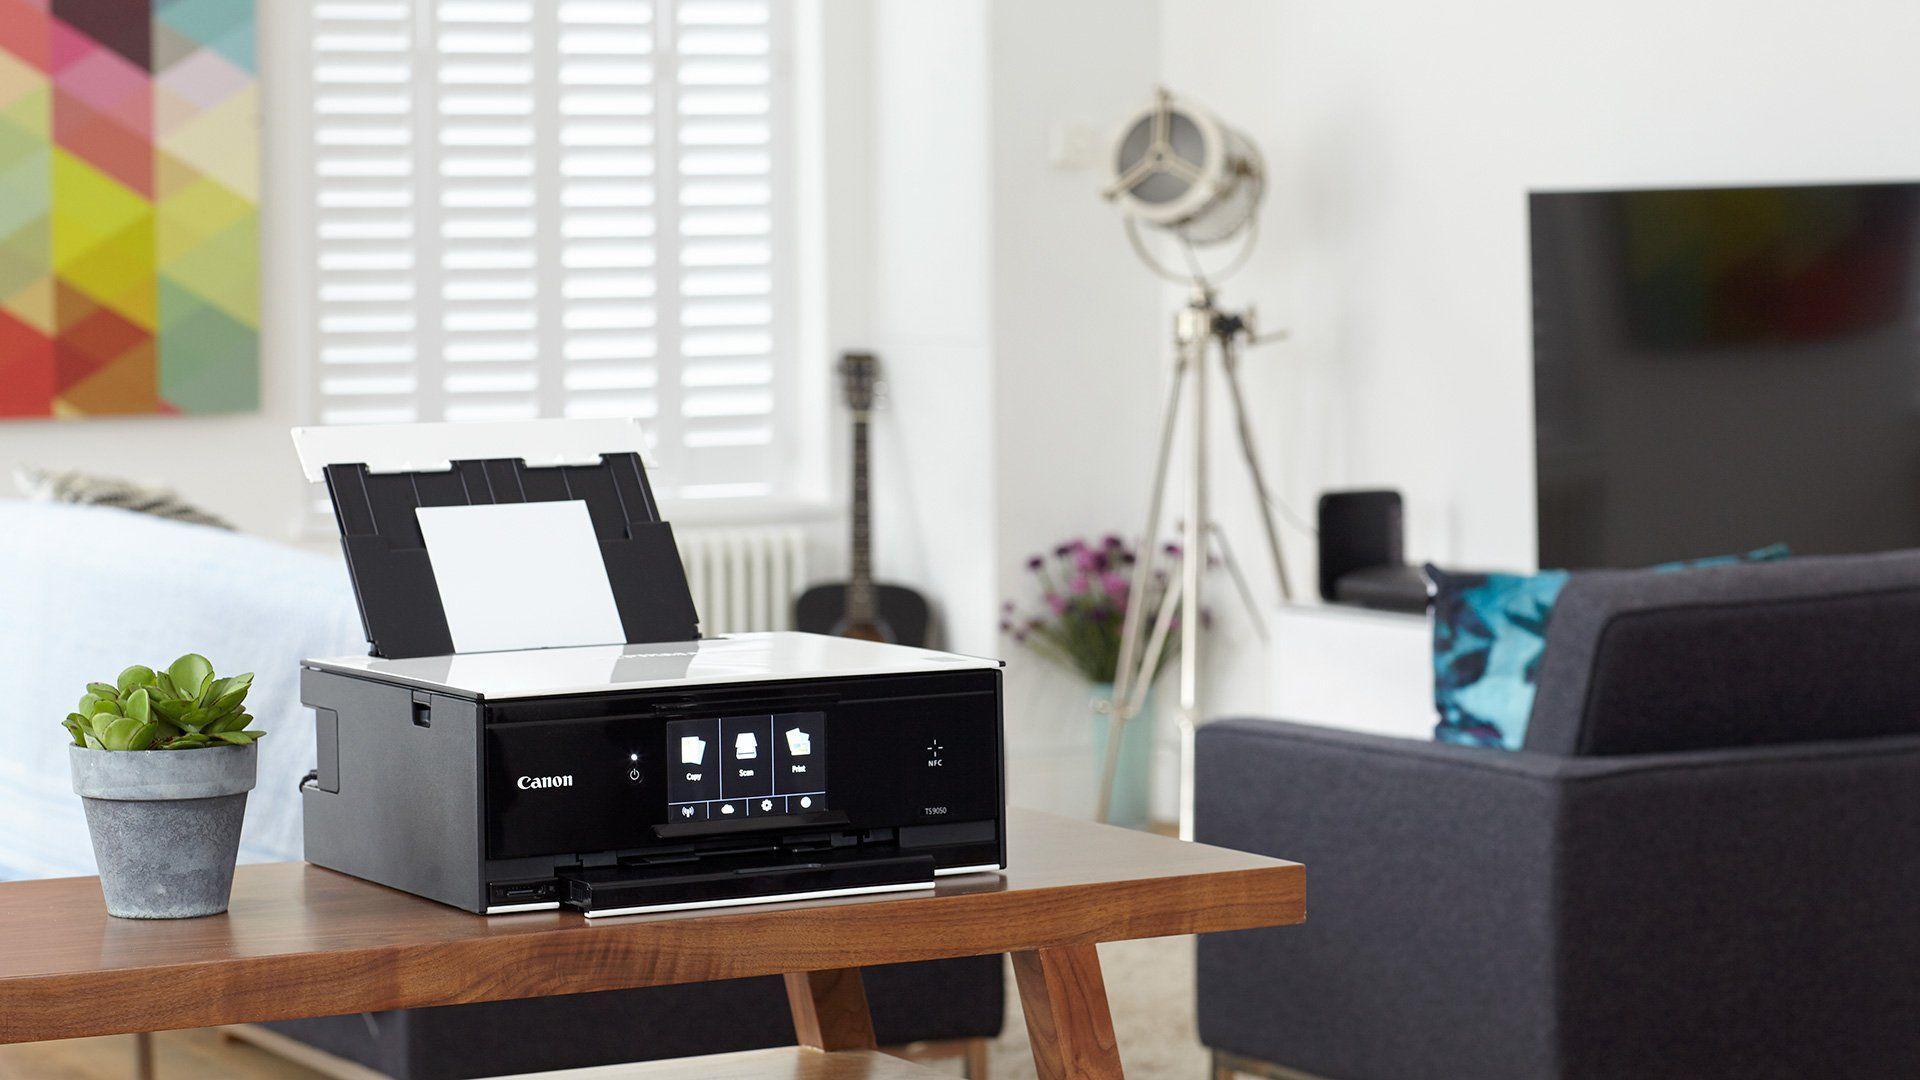 PIXMA TS9050 Series - Printers - Canon Europe